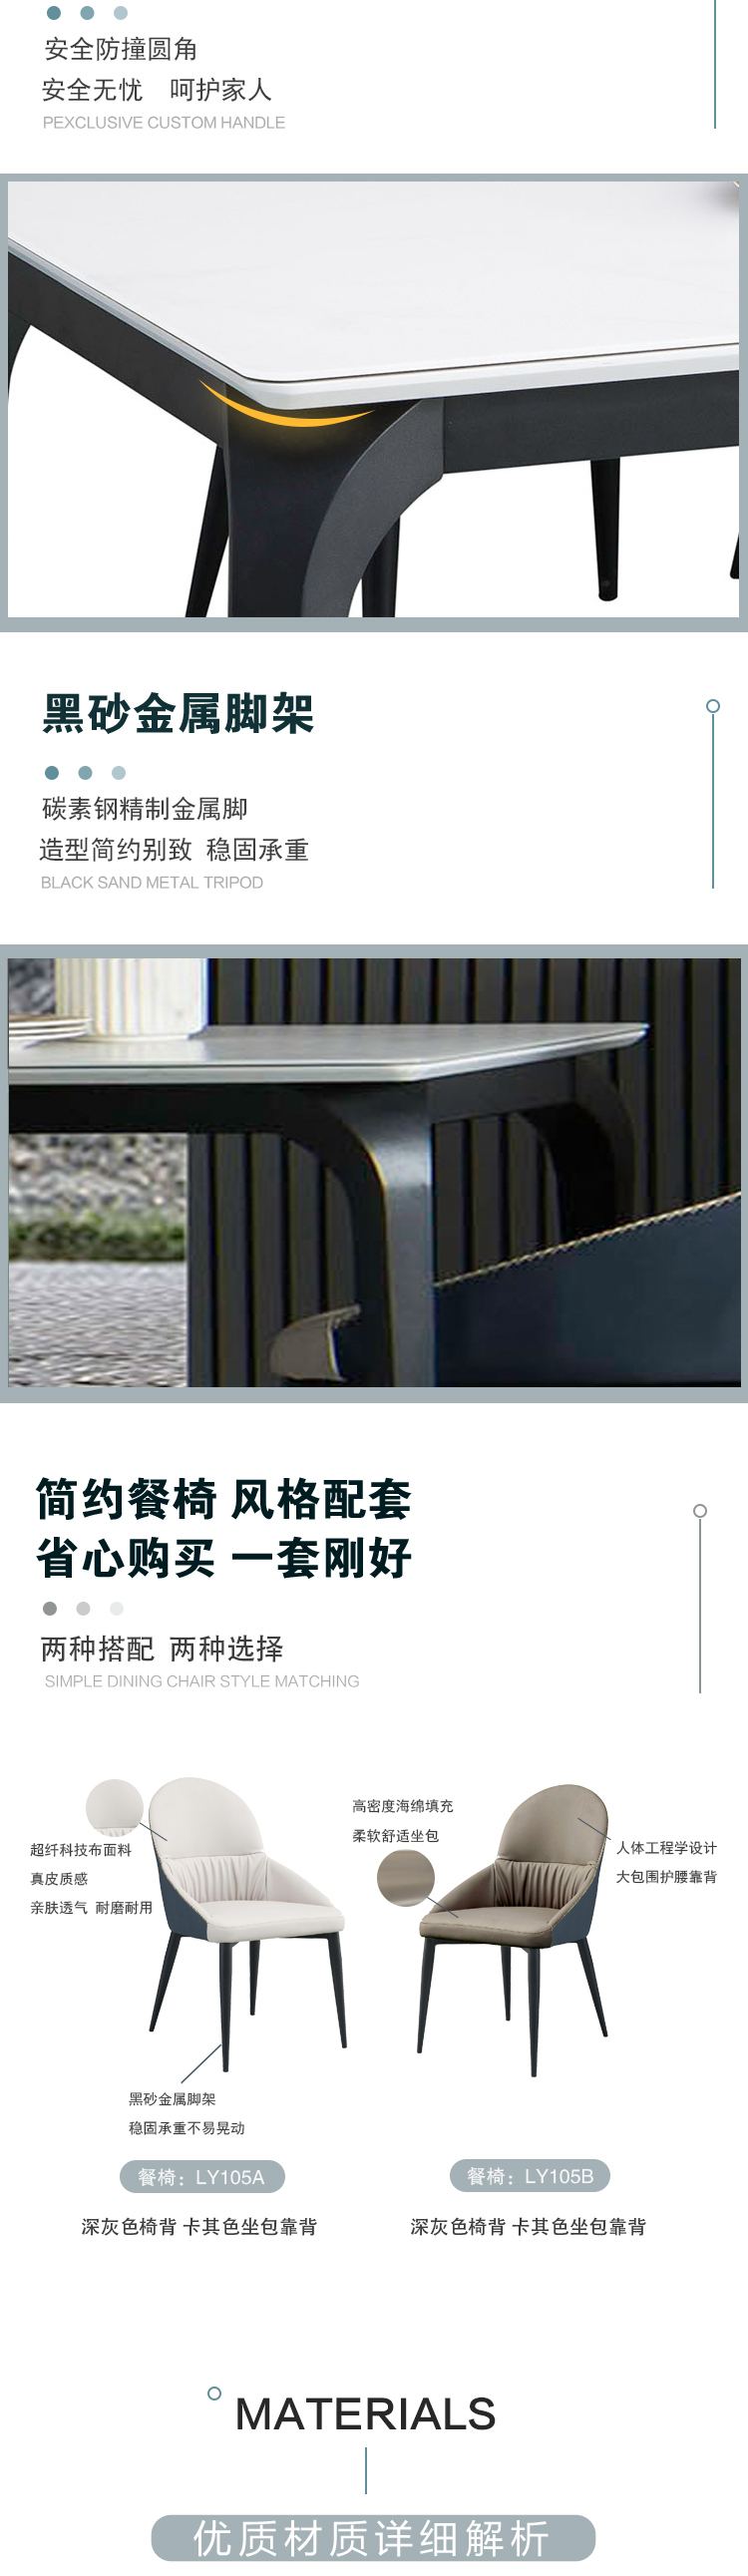 LT105餐桌椅_03.jpg